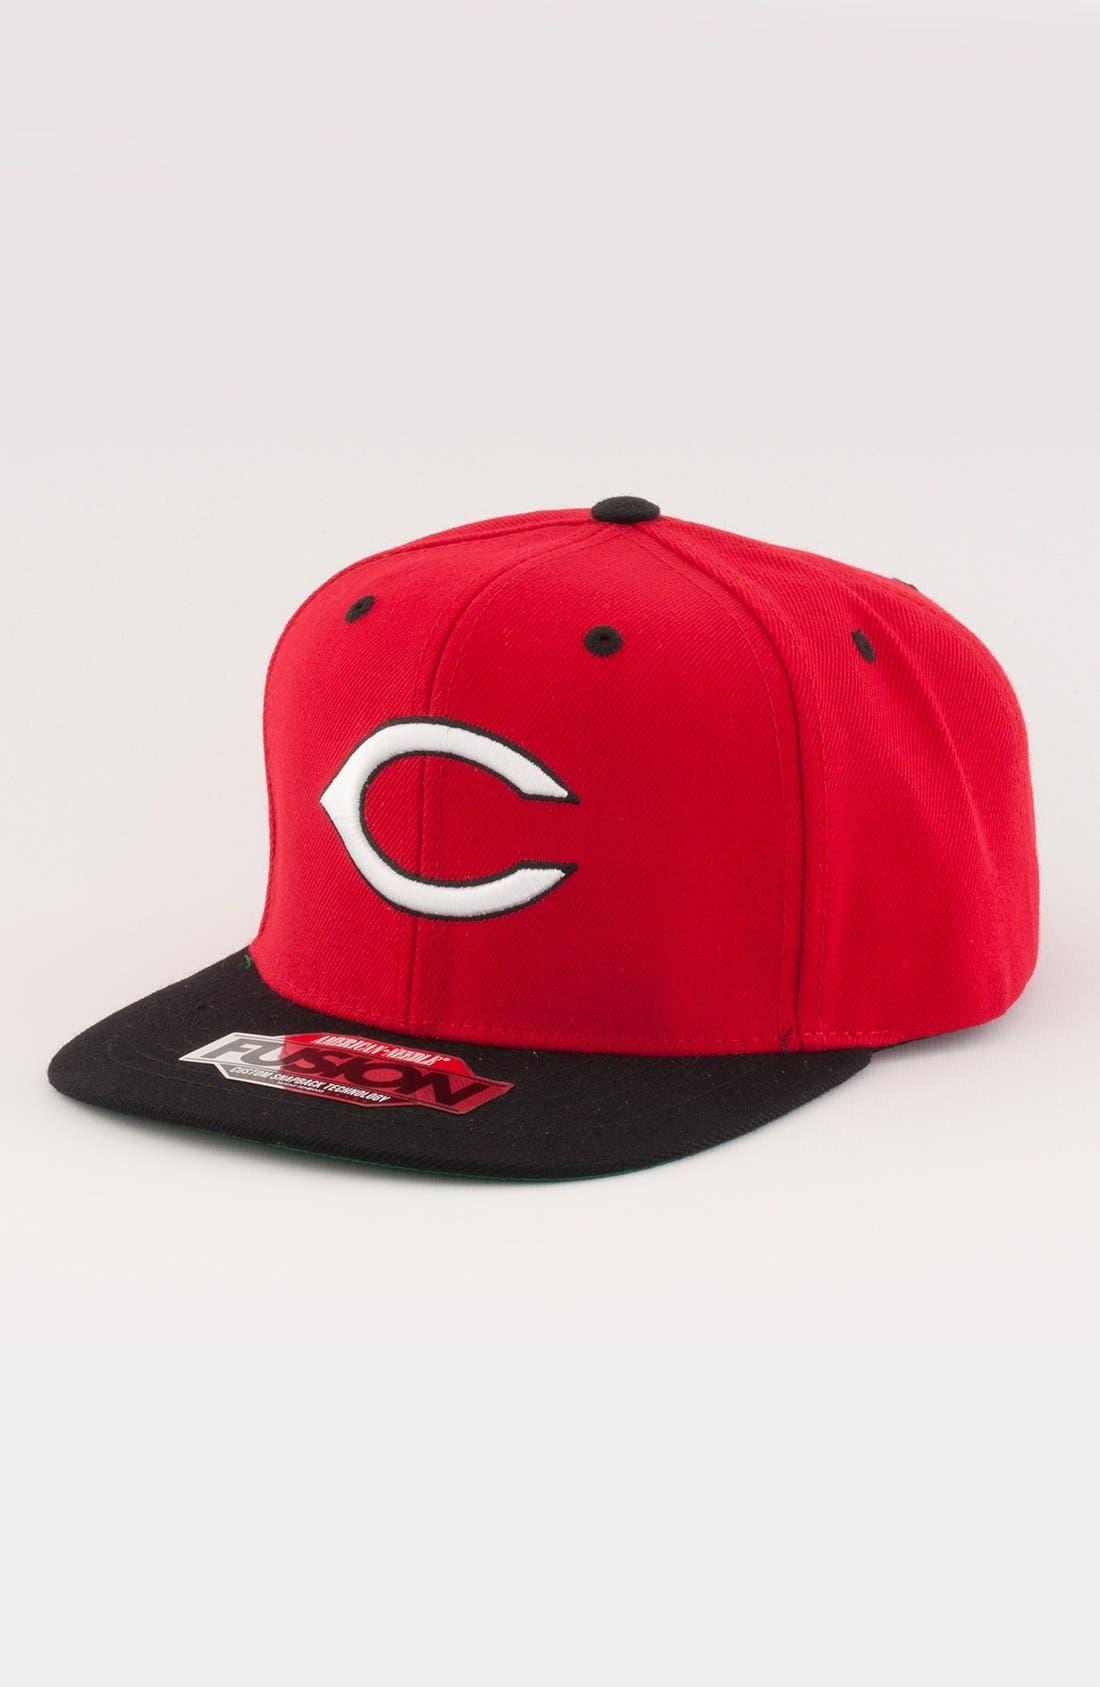 Alternate Image 1 Selected - American Needle 'Cincinnati Reds - Back 2 Front' Snapback Baseball Cap